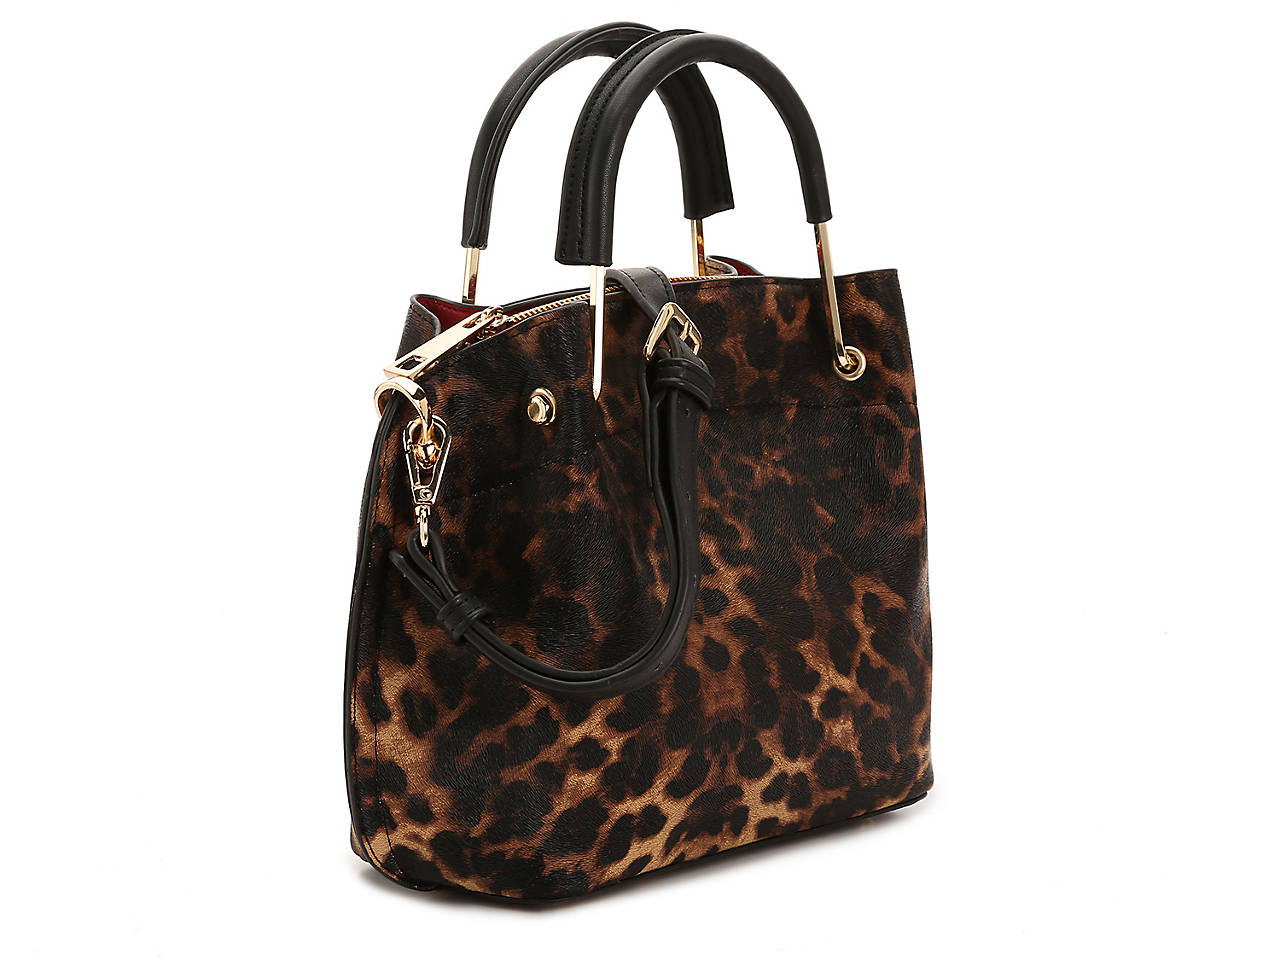 652511dd92e4 Sondra Roberts Printed Faux Leather Satchel Women s Handbags ...